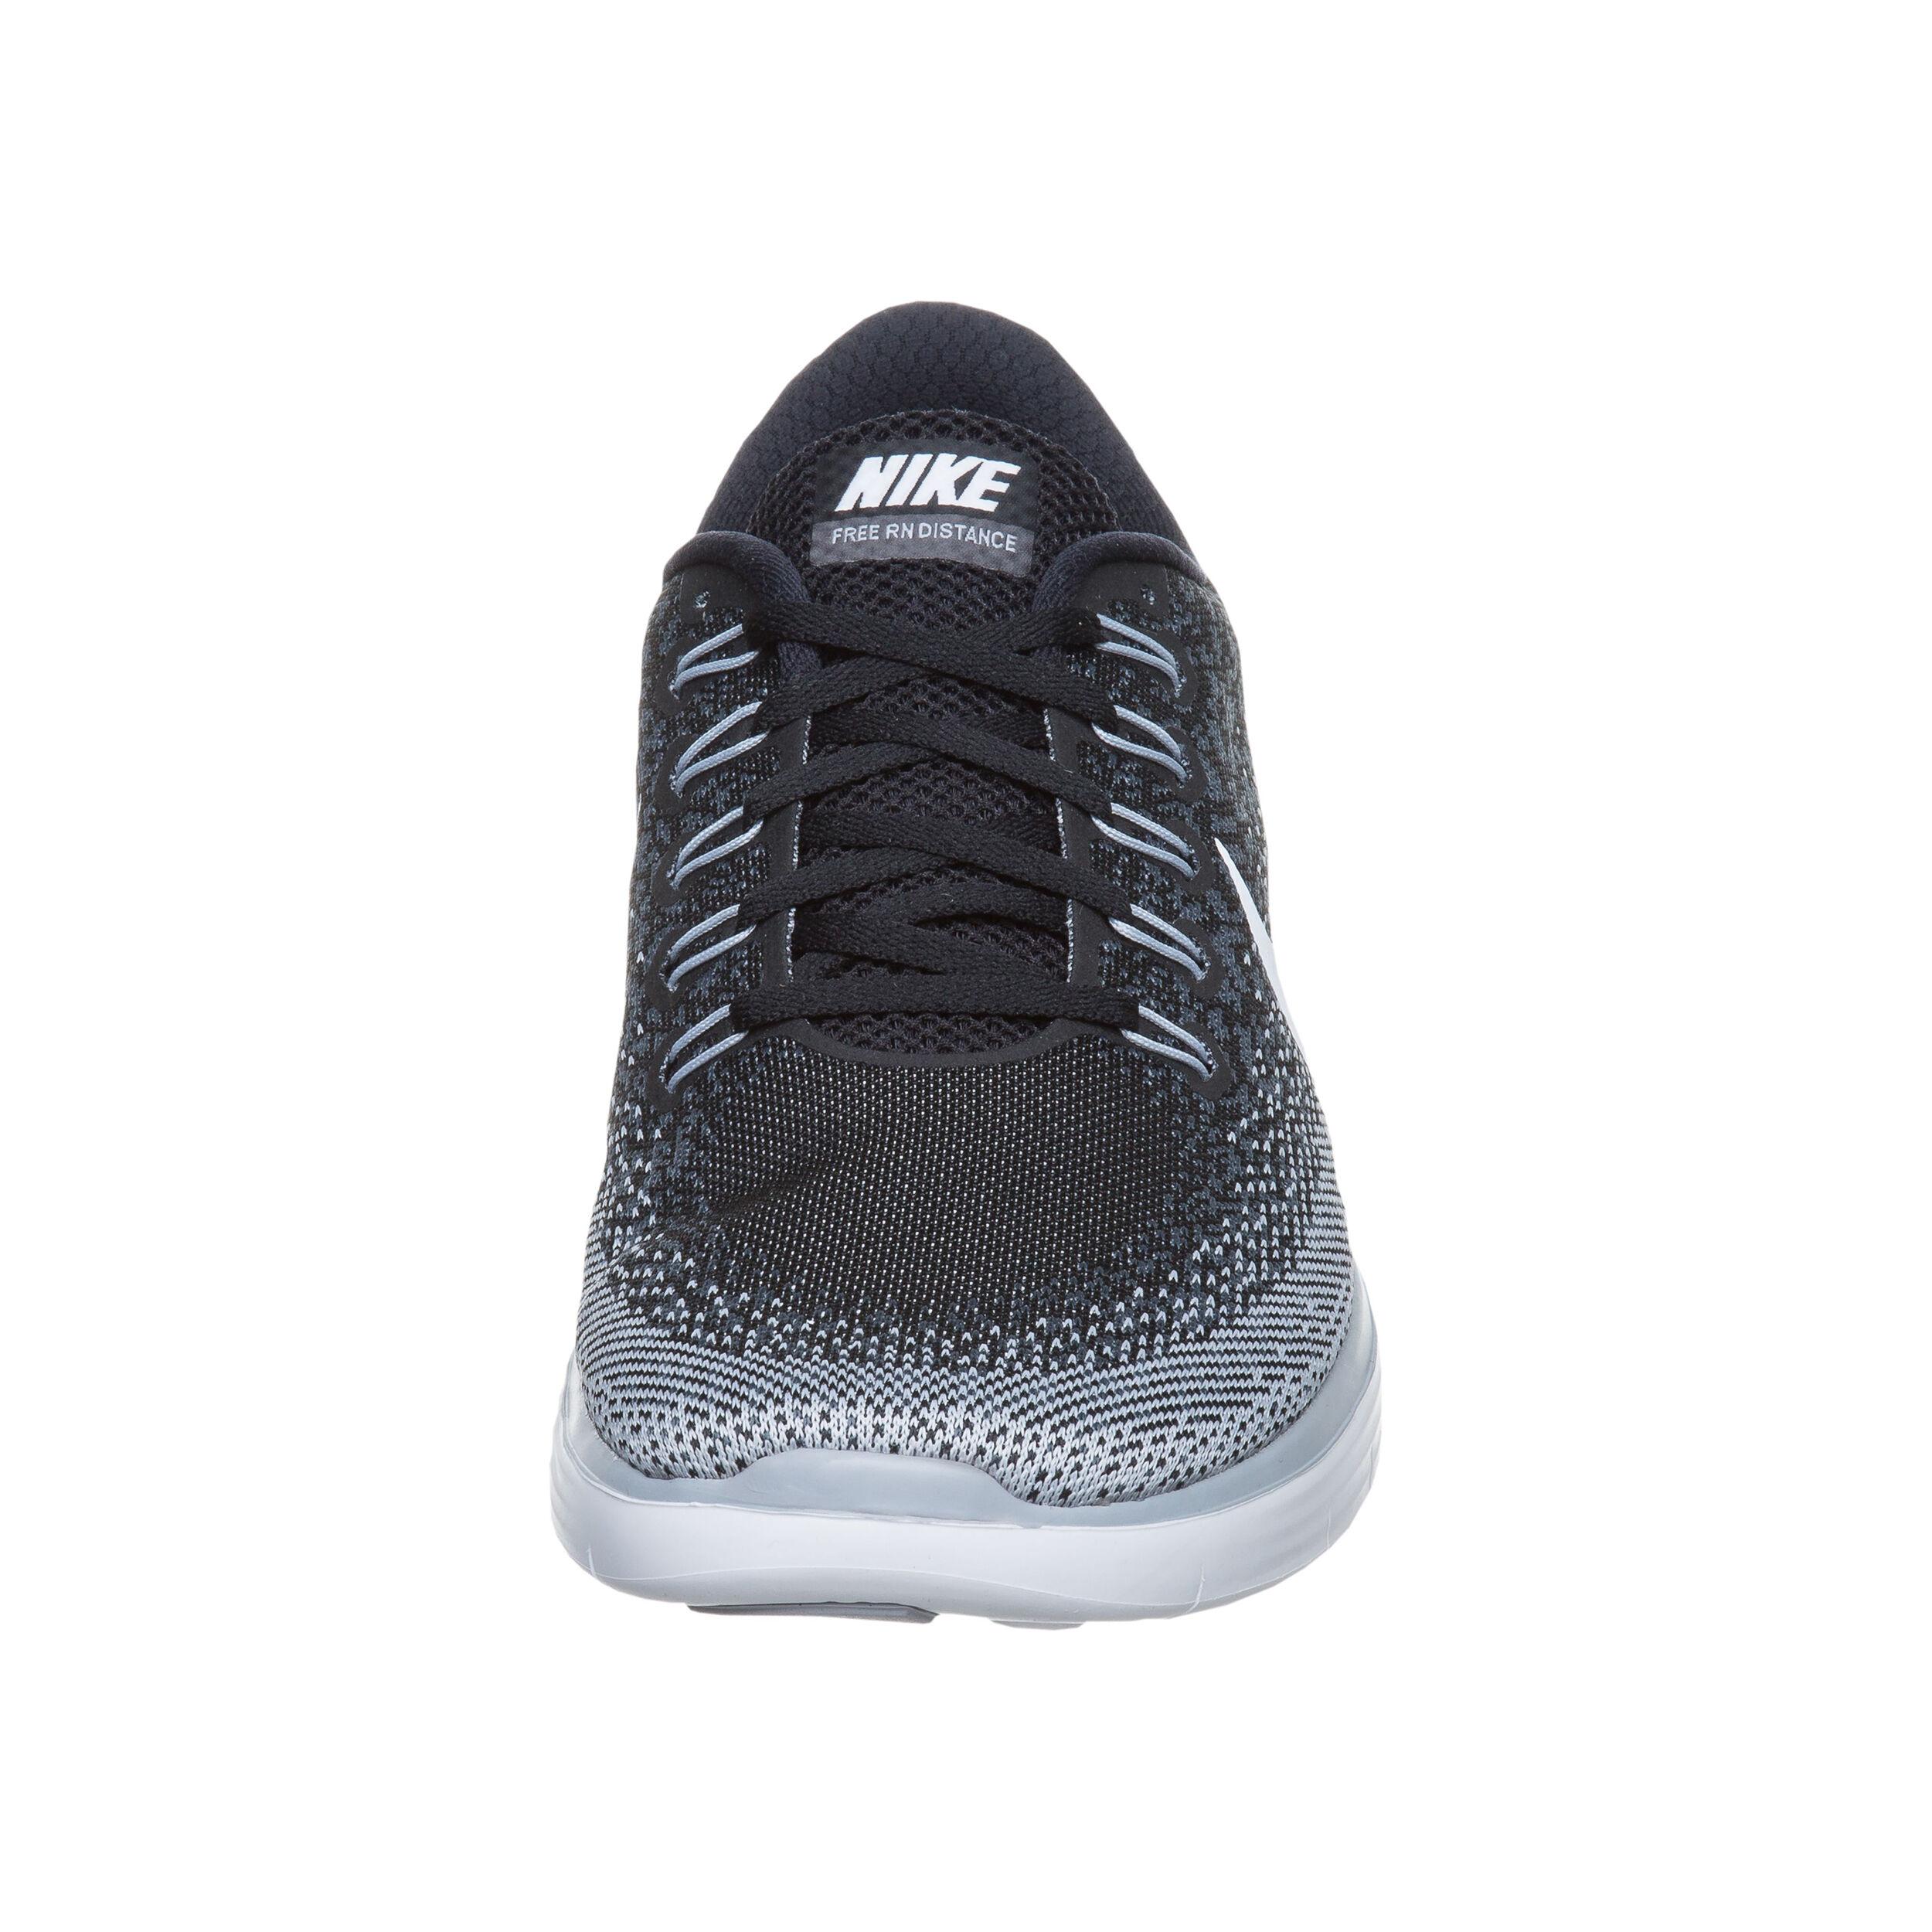 Nike Free RN Distance 2 Natural Running Schuh Herren